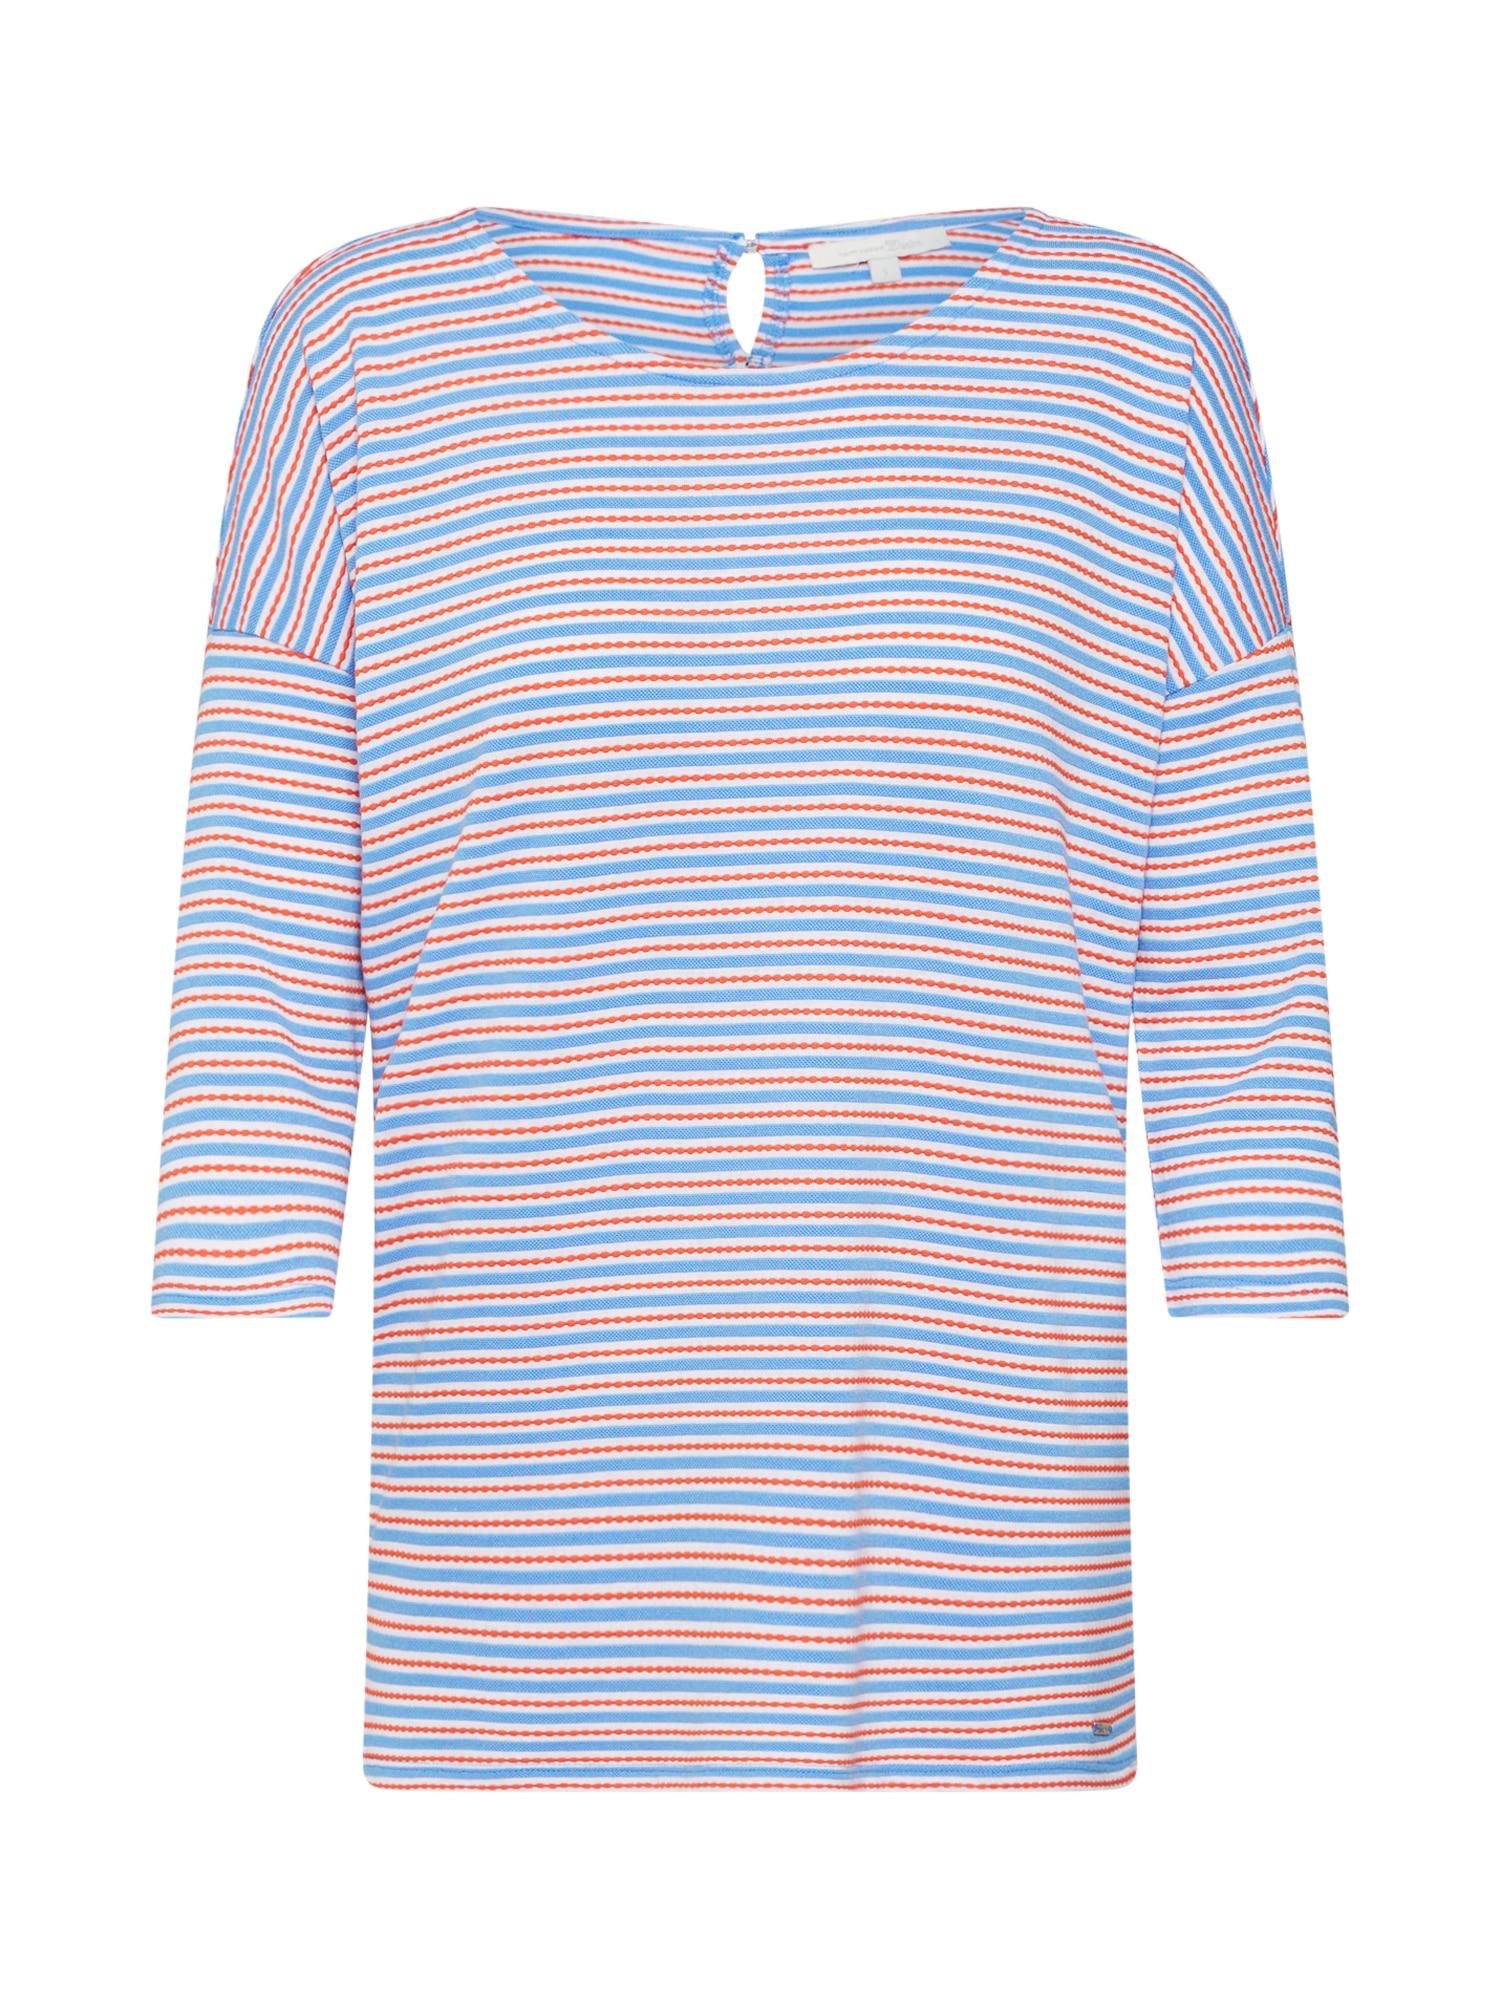 TOM TAILOR DENIM Tričko  modrá / červená / bílá